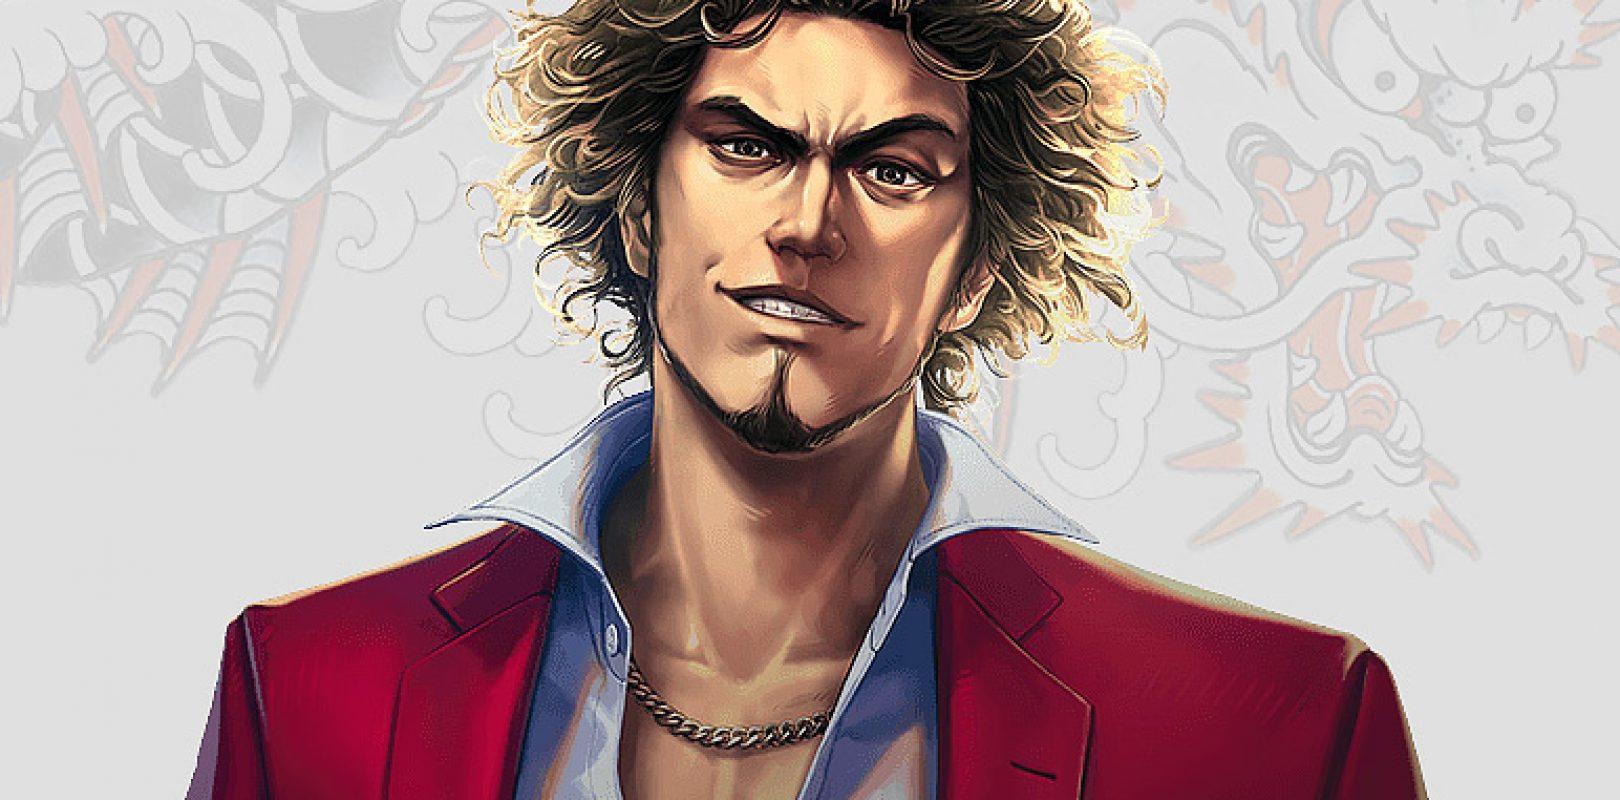 Persona 5 Soundtrack Steals Hearts In Yakuza Like A Dragon Push